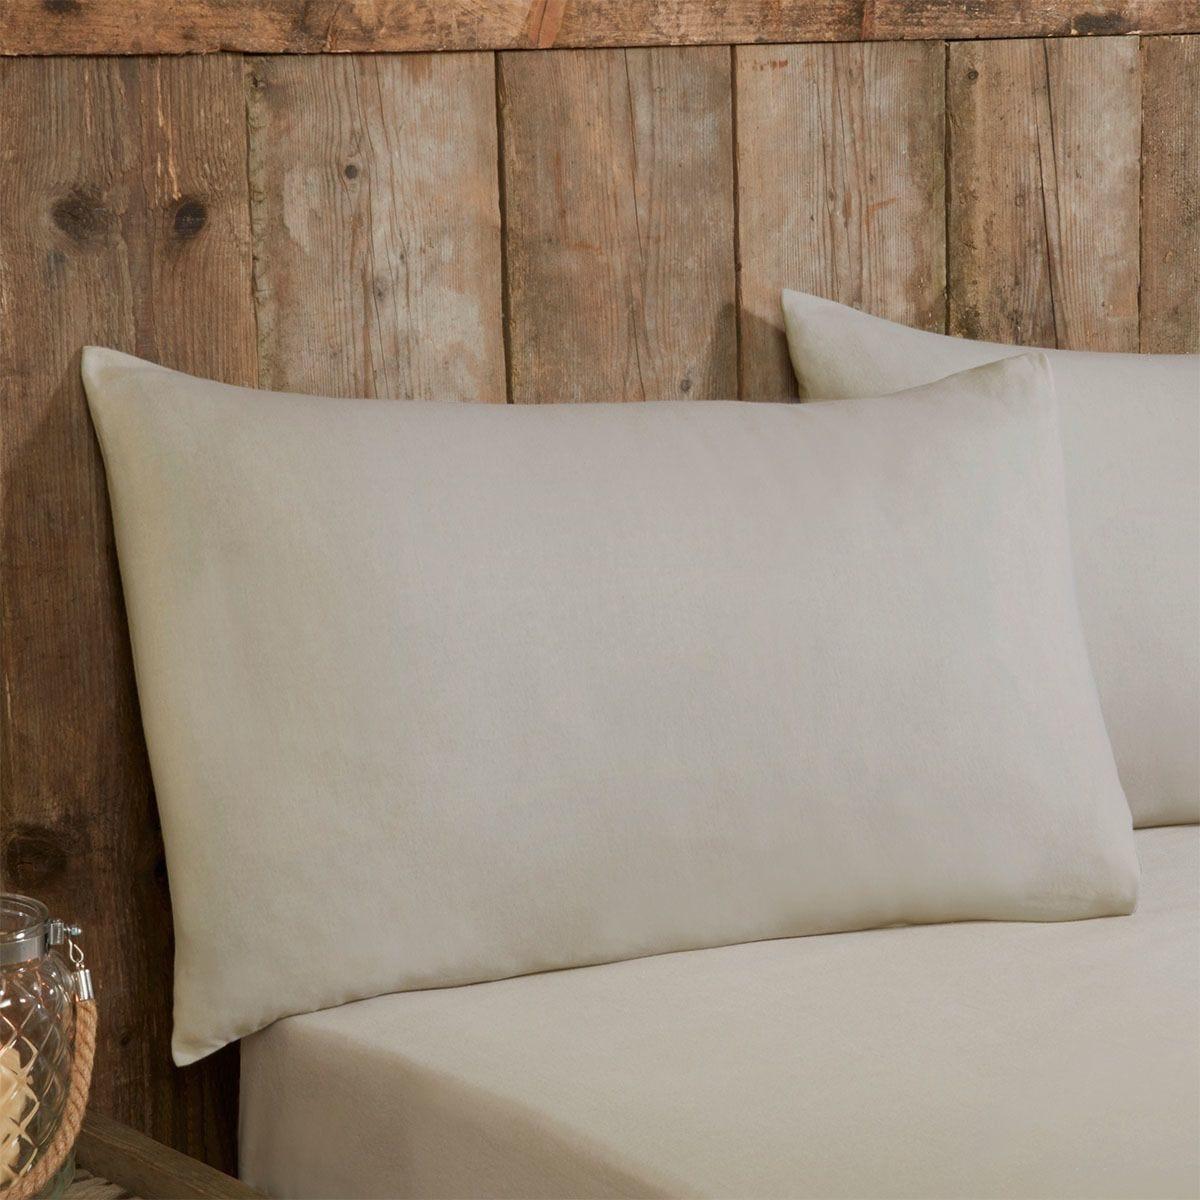 Silentnight Plain Pillowcases Pair - Natural